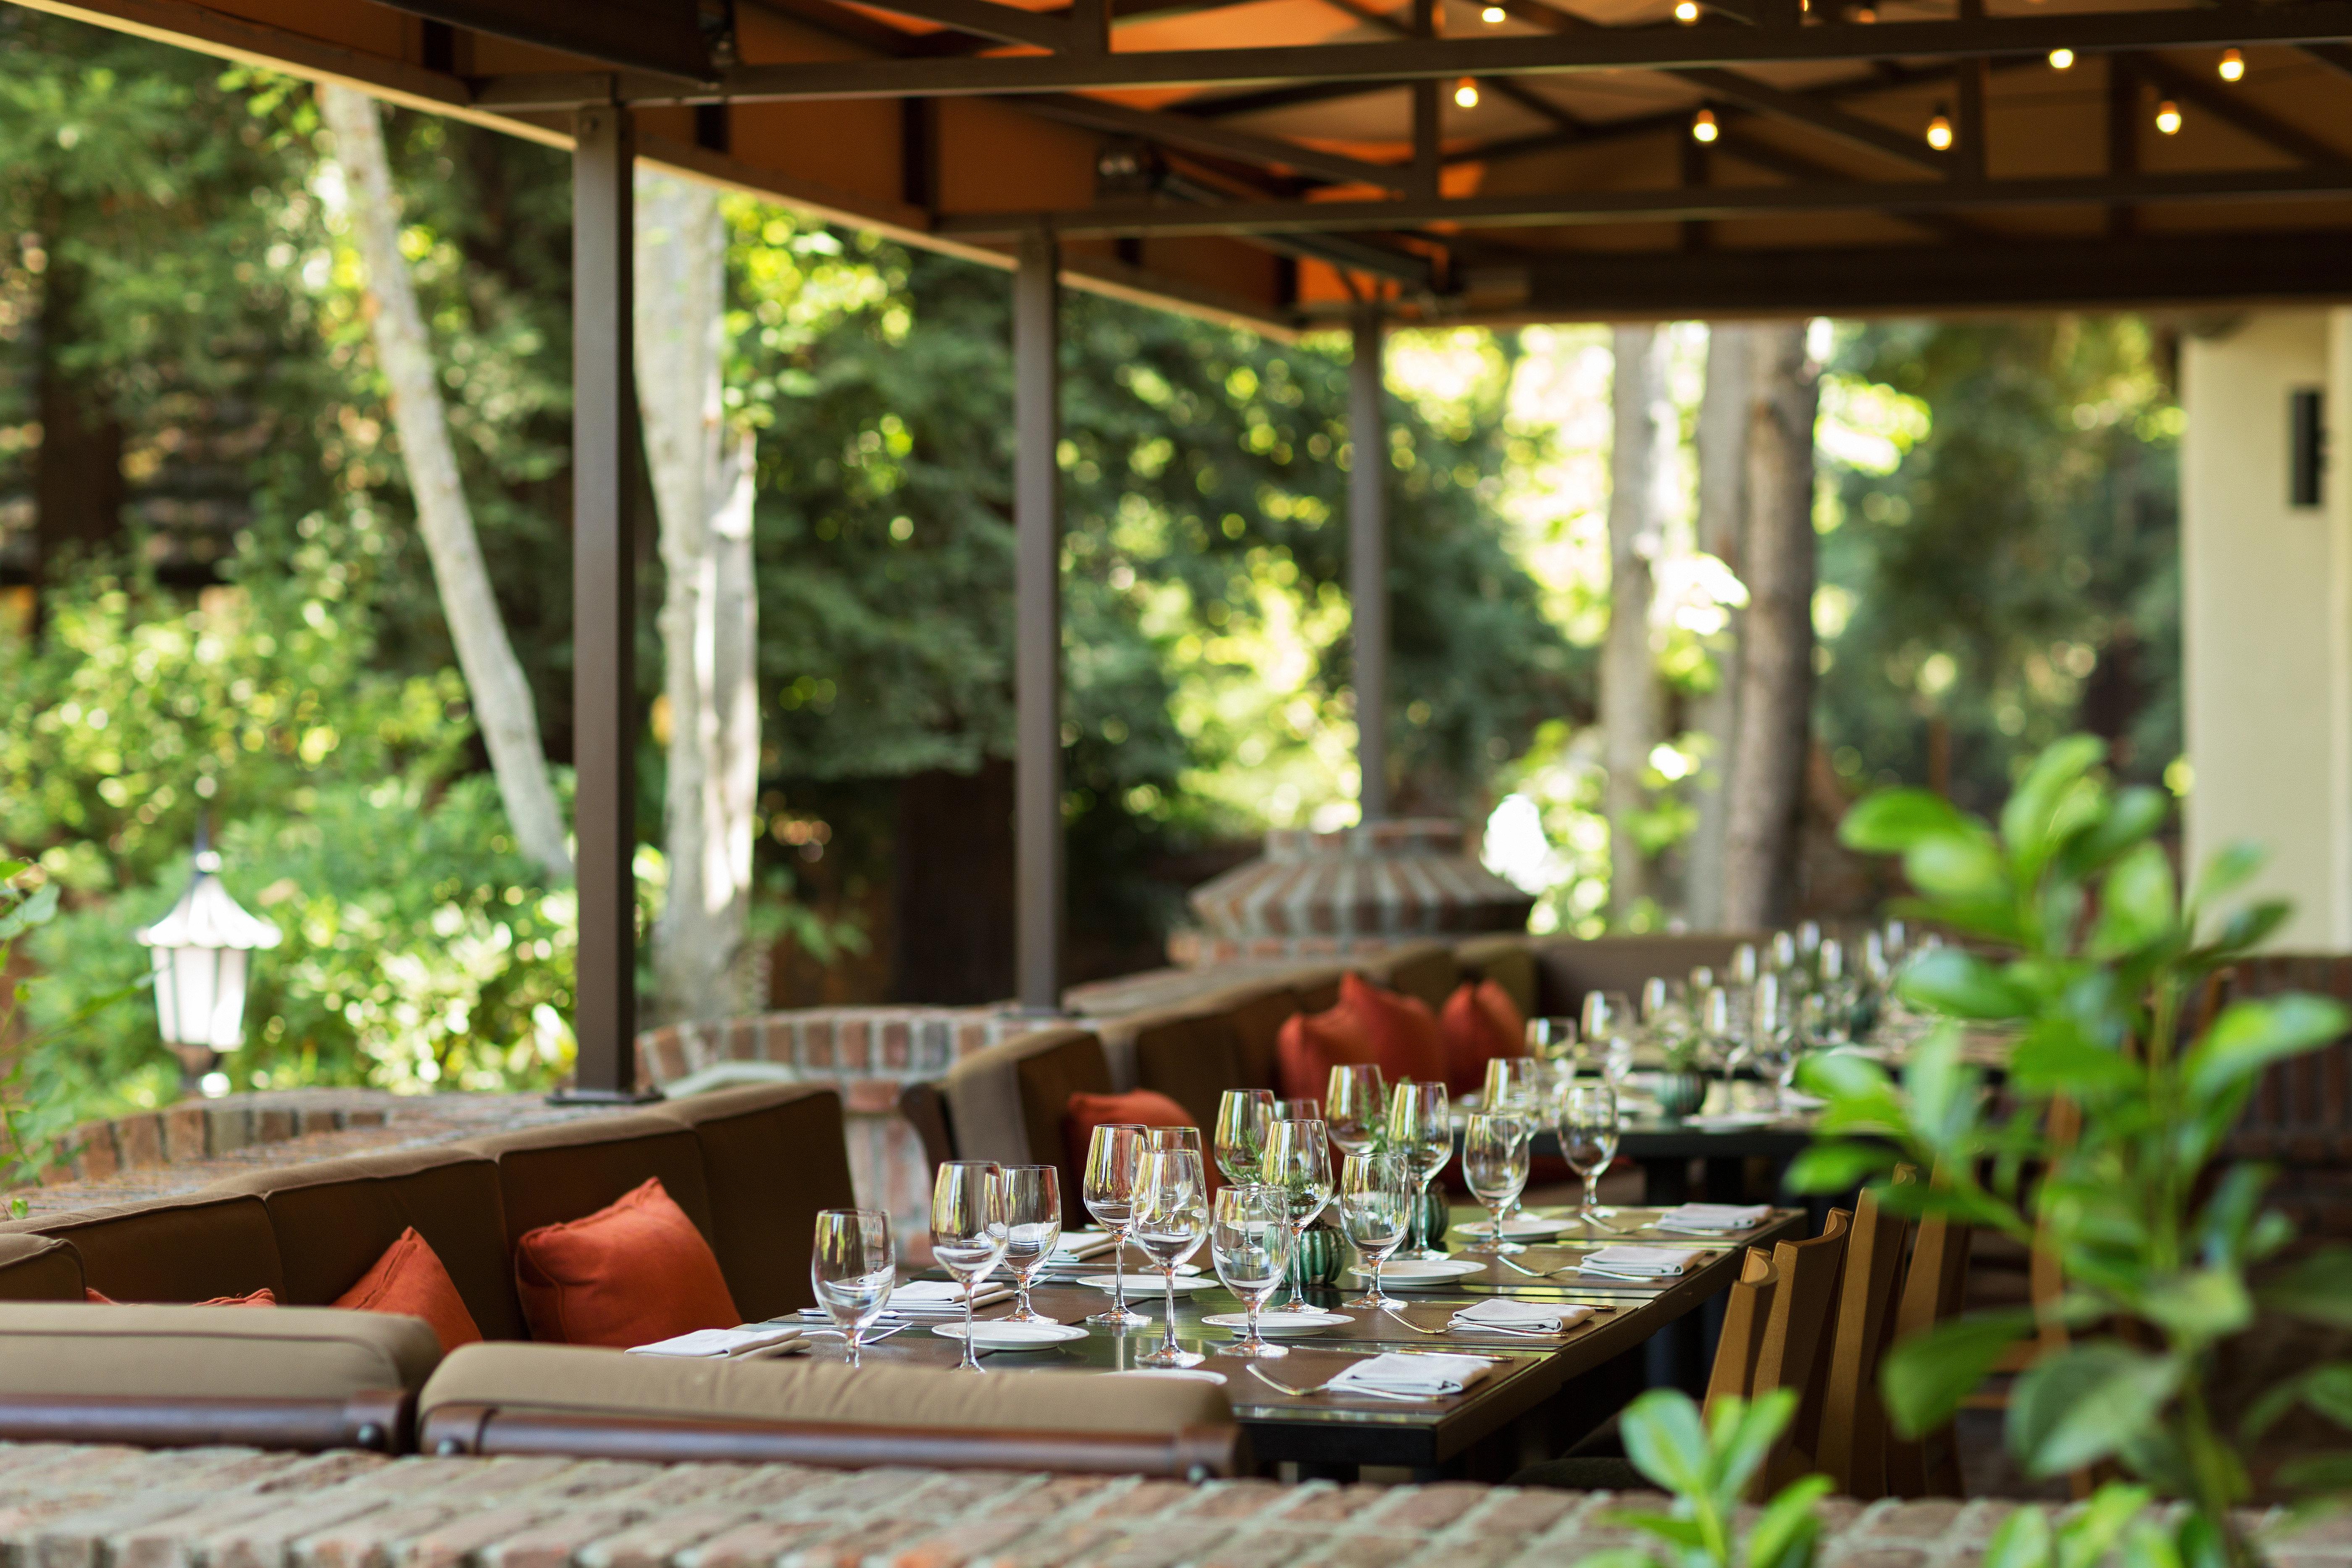 Deck Dining Drink Eat Inn Patio Romantic Terrace restaurant backyard Resort cottage outdoor structure rehearsal dinner dining table set